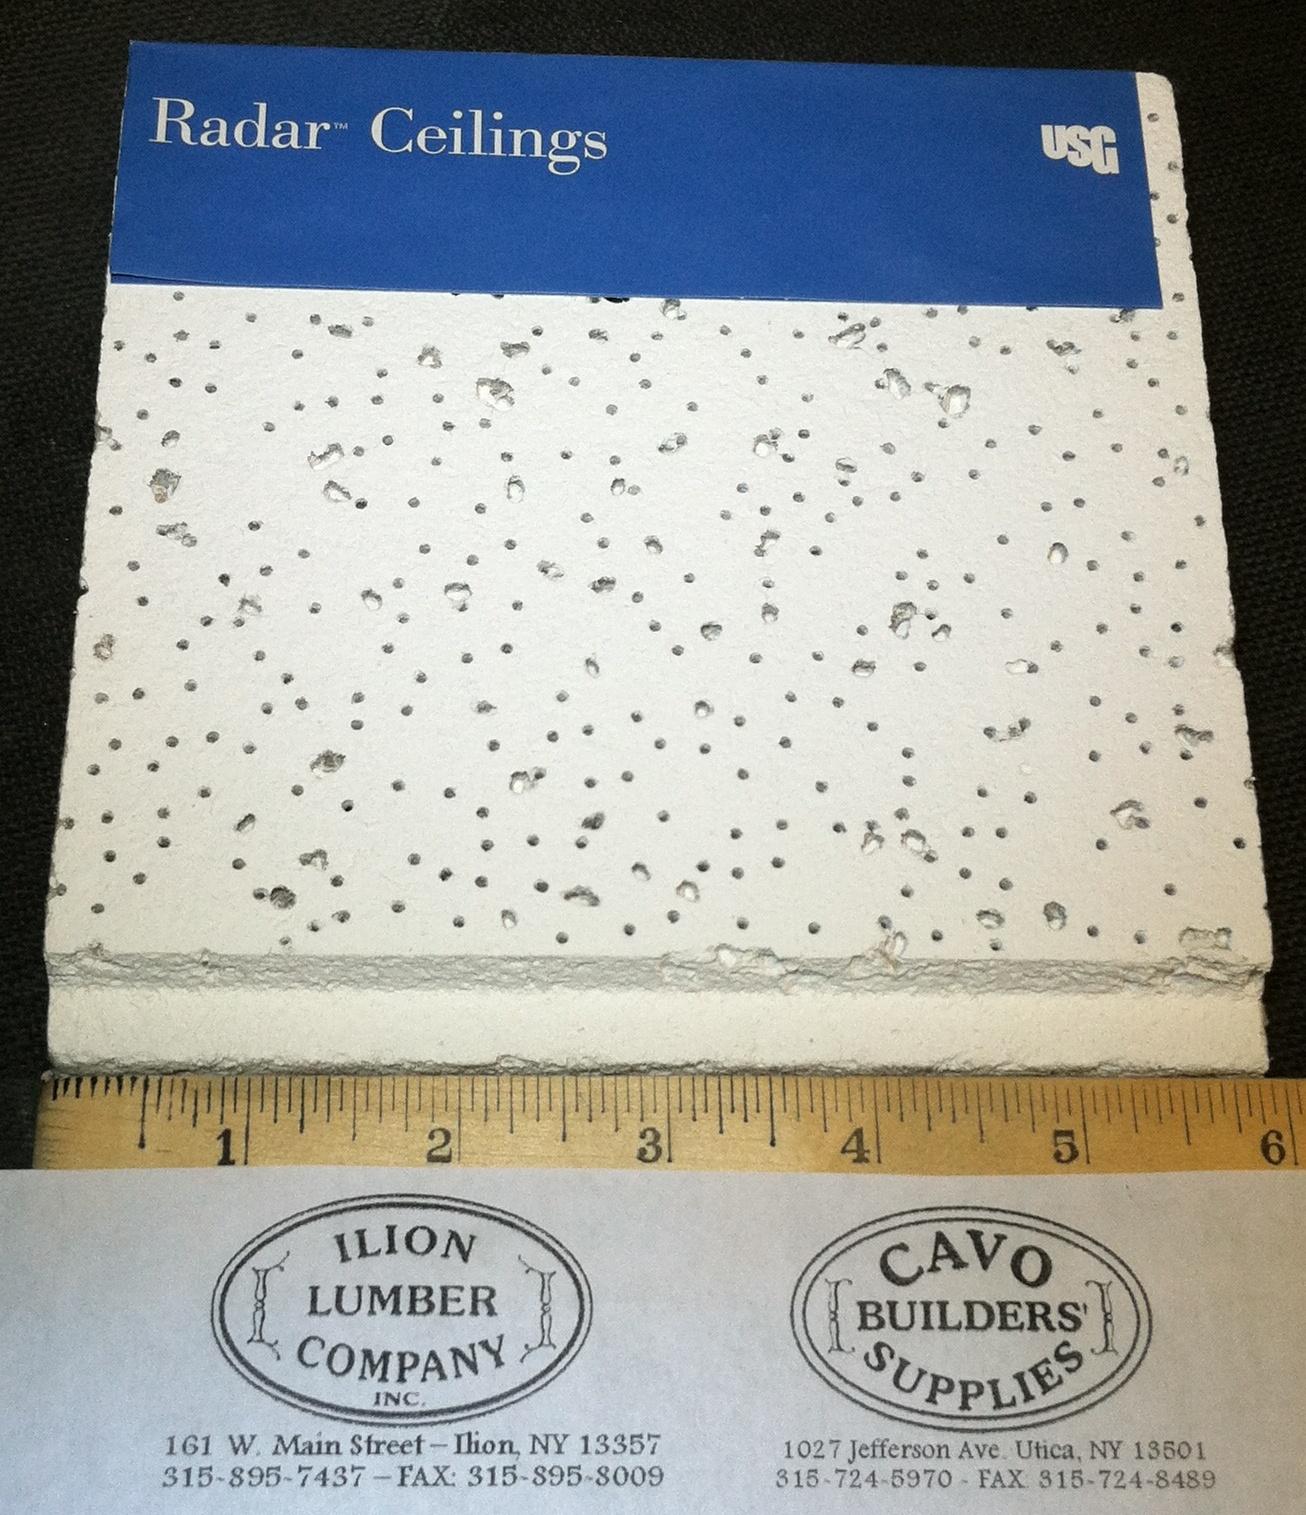 Ceiling Tile Ilion Lumber Company